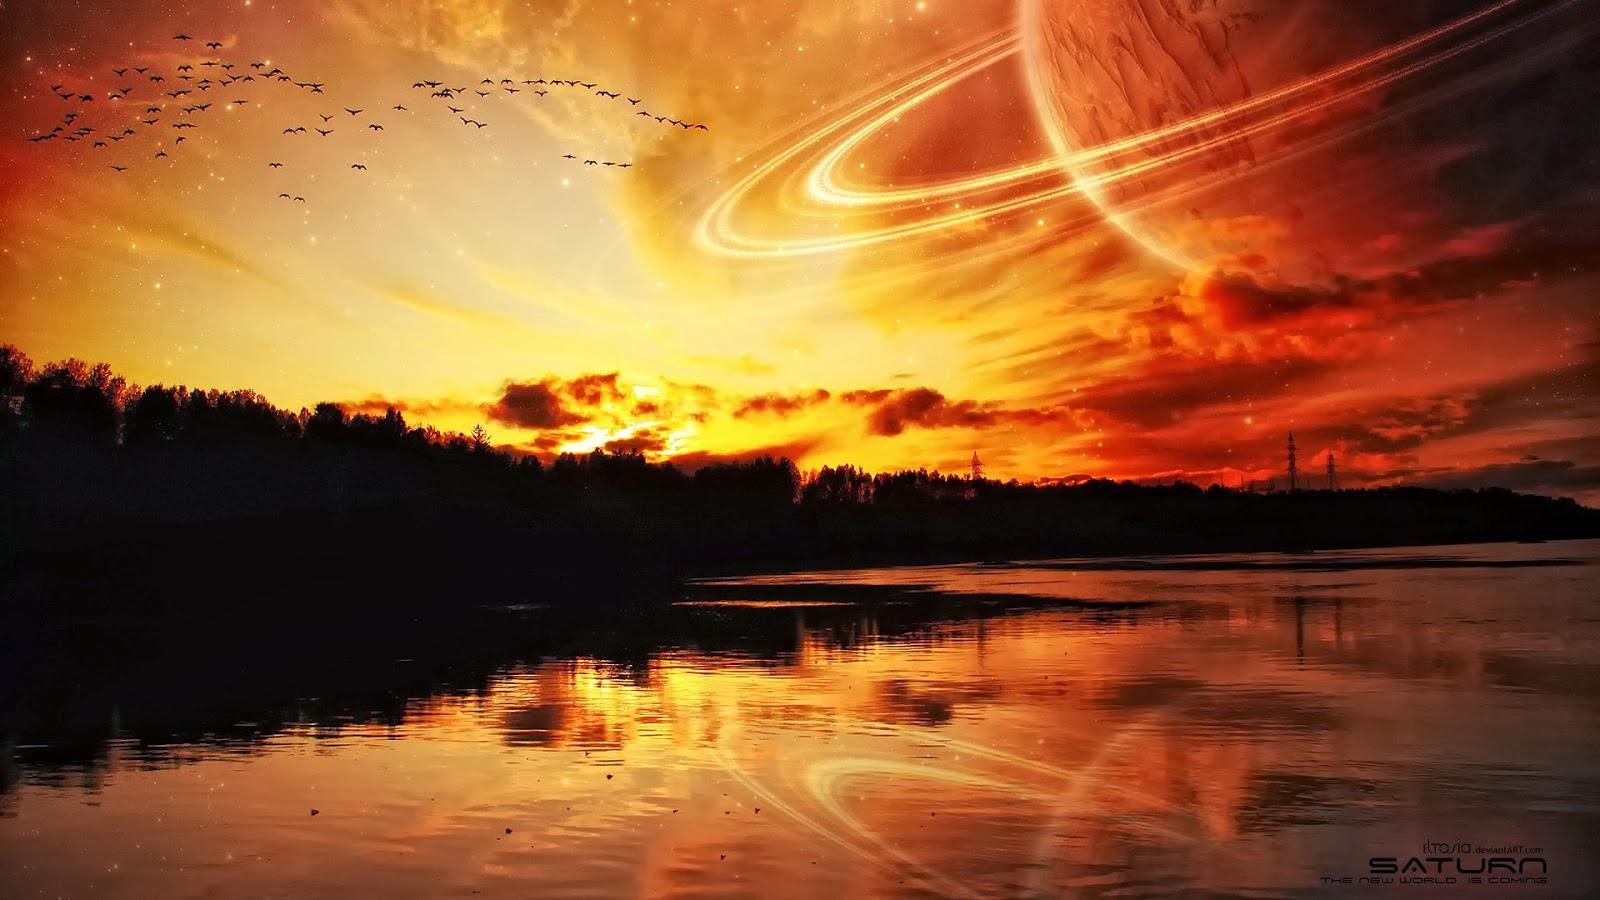 Close Planet Saturn